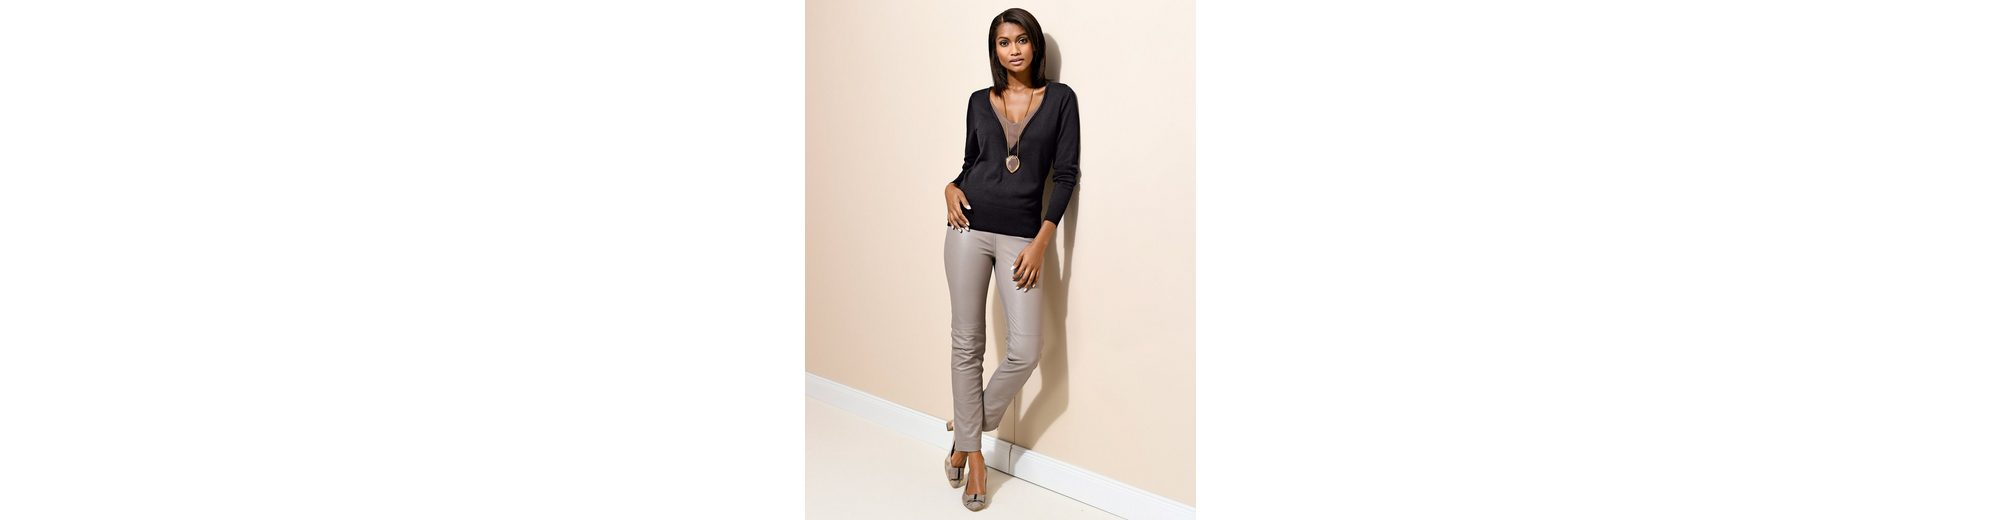 Alba Moda Pullover in modischer 2-in-1-Optik Billig Store jK6AZ